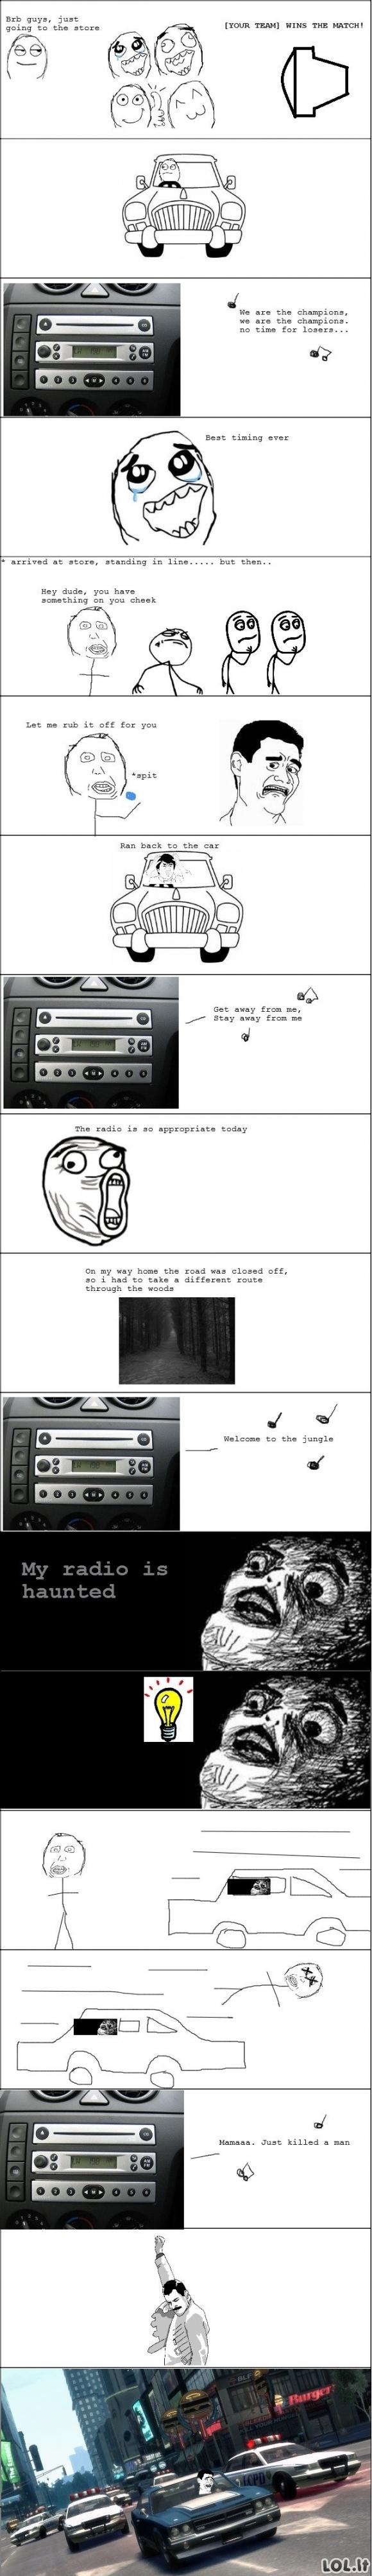 Magiška radija